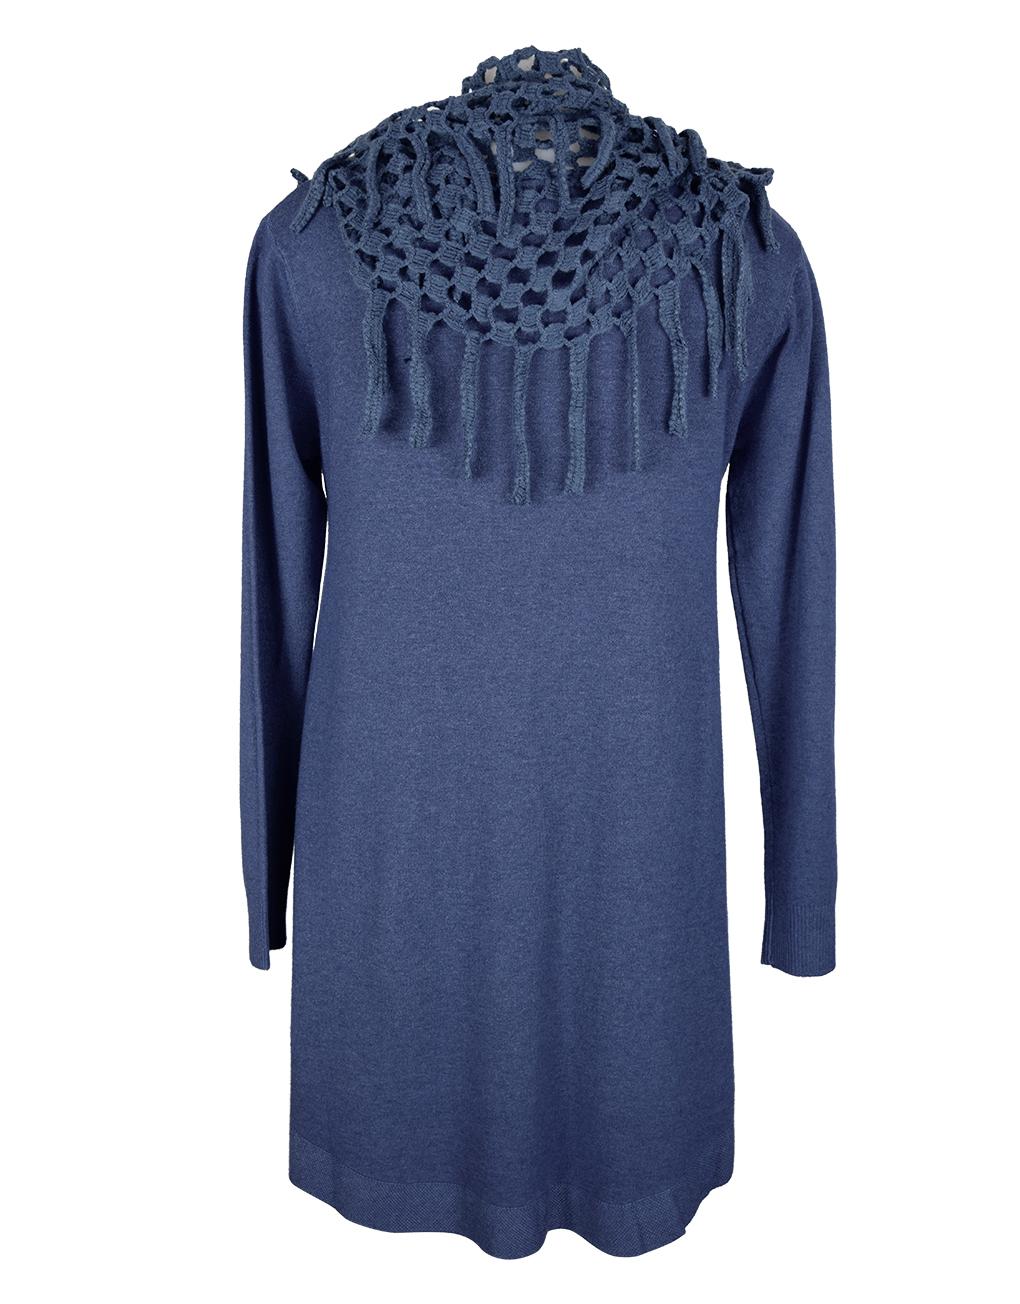 Italian-dress-blue-with-holey-scarf-snood1